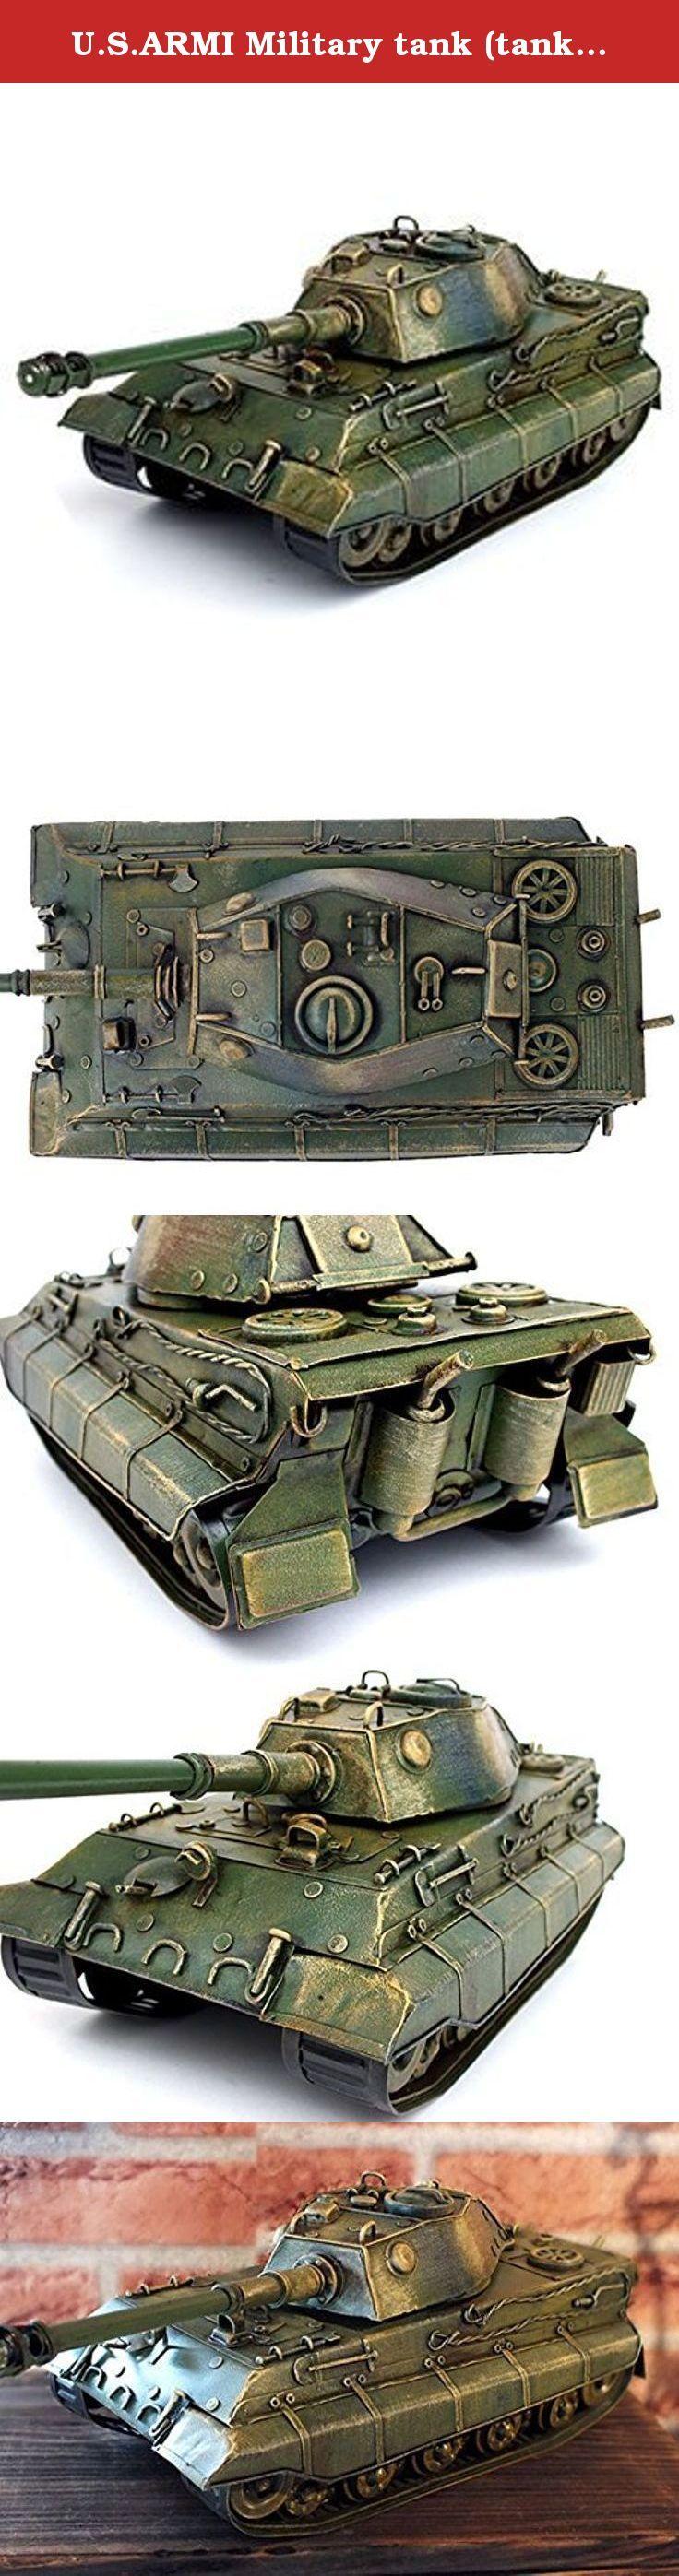 U.S.ARMI Military tank (tanks) military tank tin die-cast! !. It's shipped off from Japan.